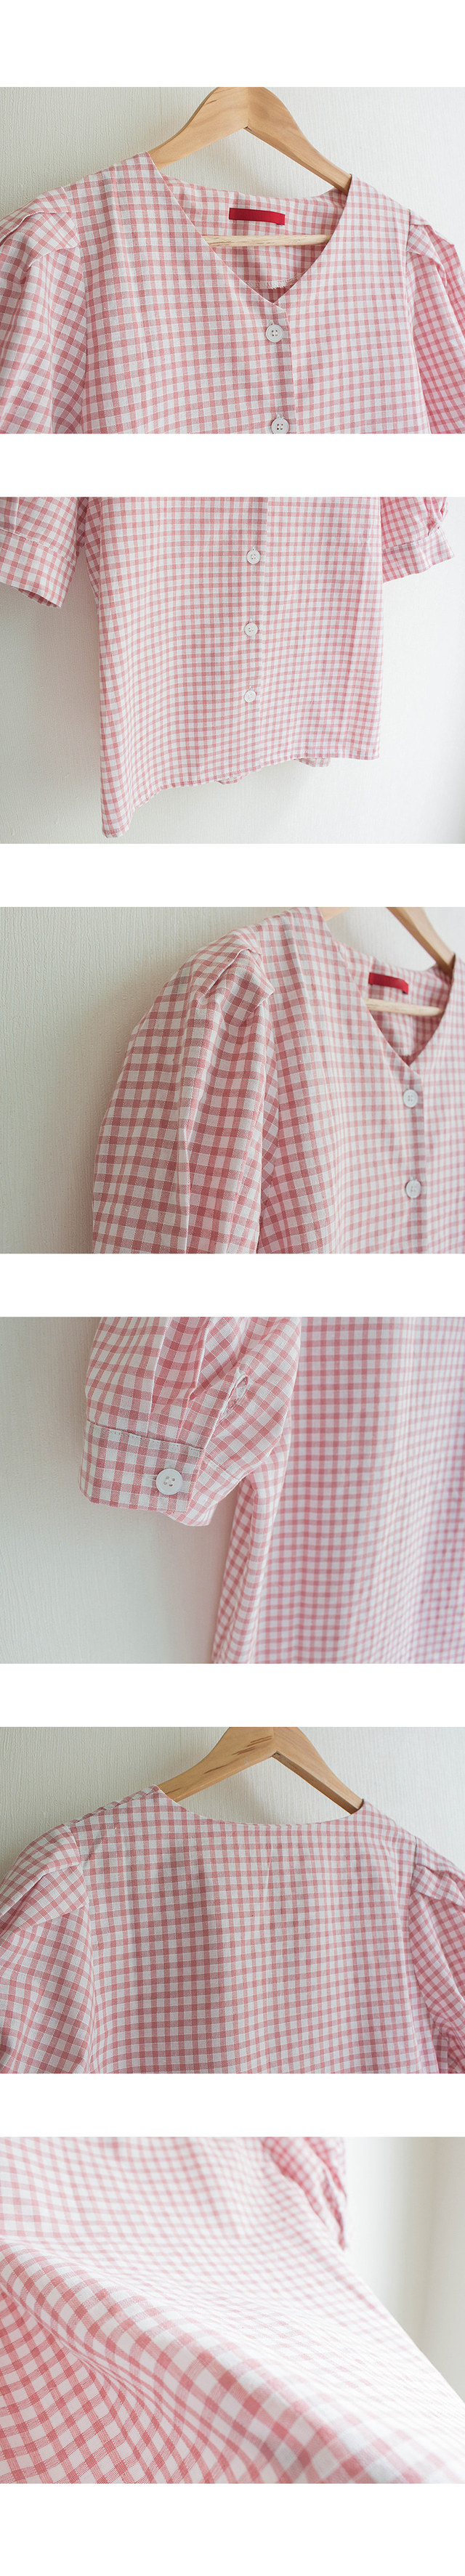 Puff sleeve button check shirt